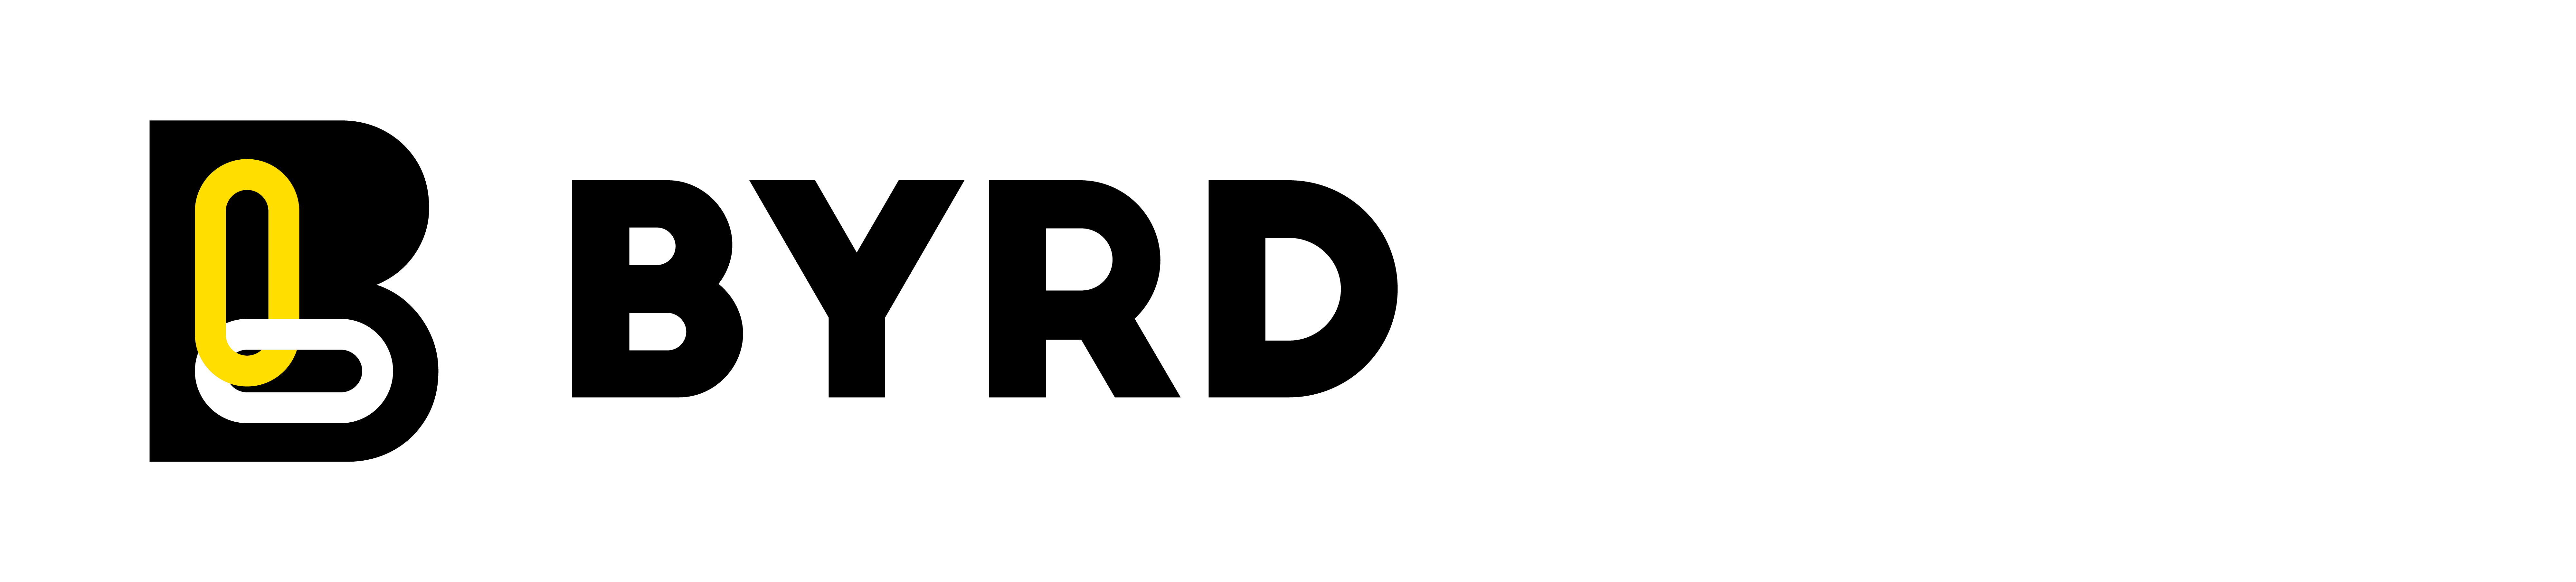 log-01